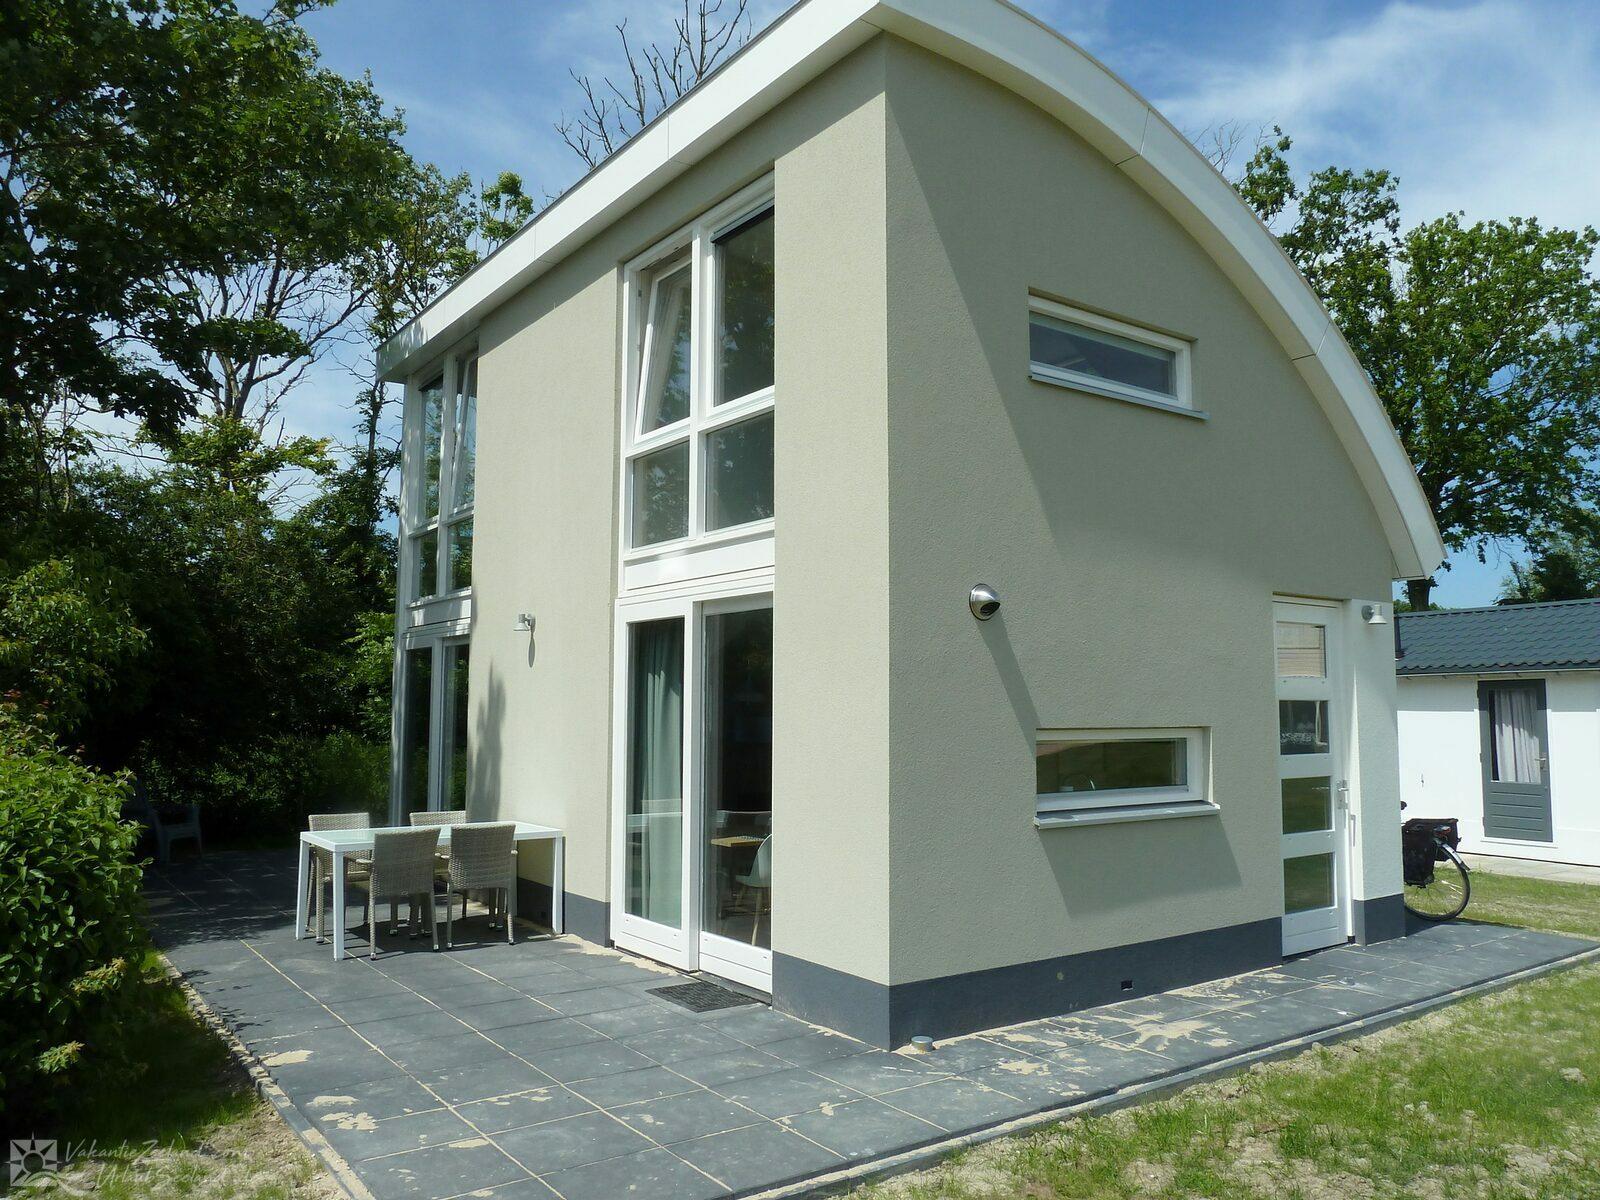 VZ905 Freistehendes Ferienhaus in Vlissingen